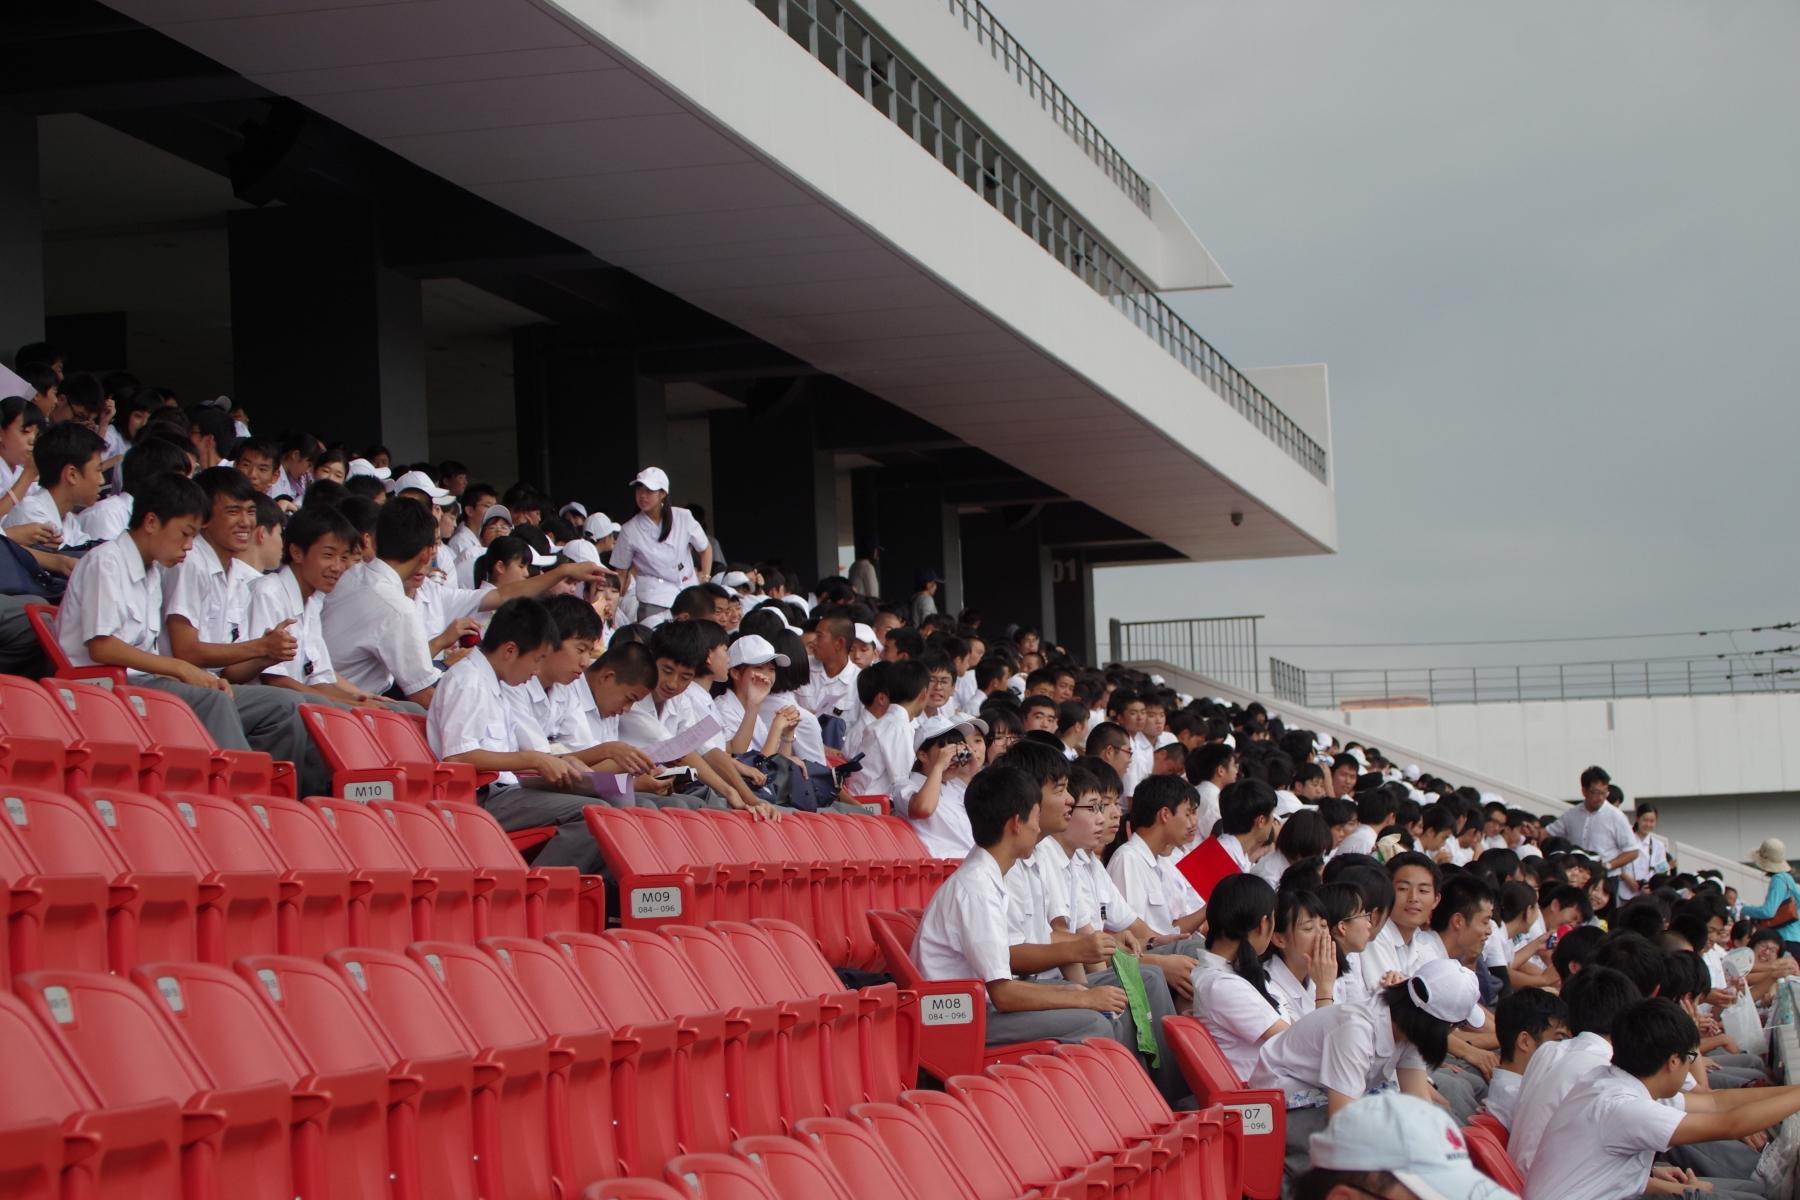 http://kokura-rugby.sakura.ne.jp/180917_111604_0044.jpg